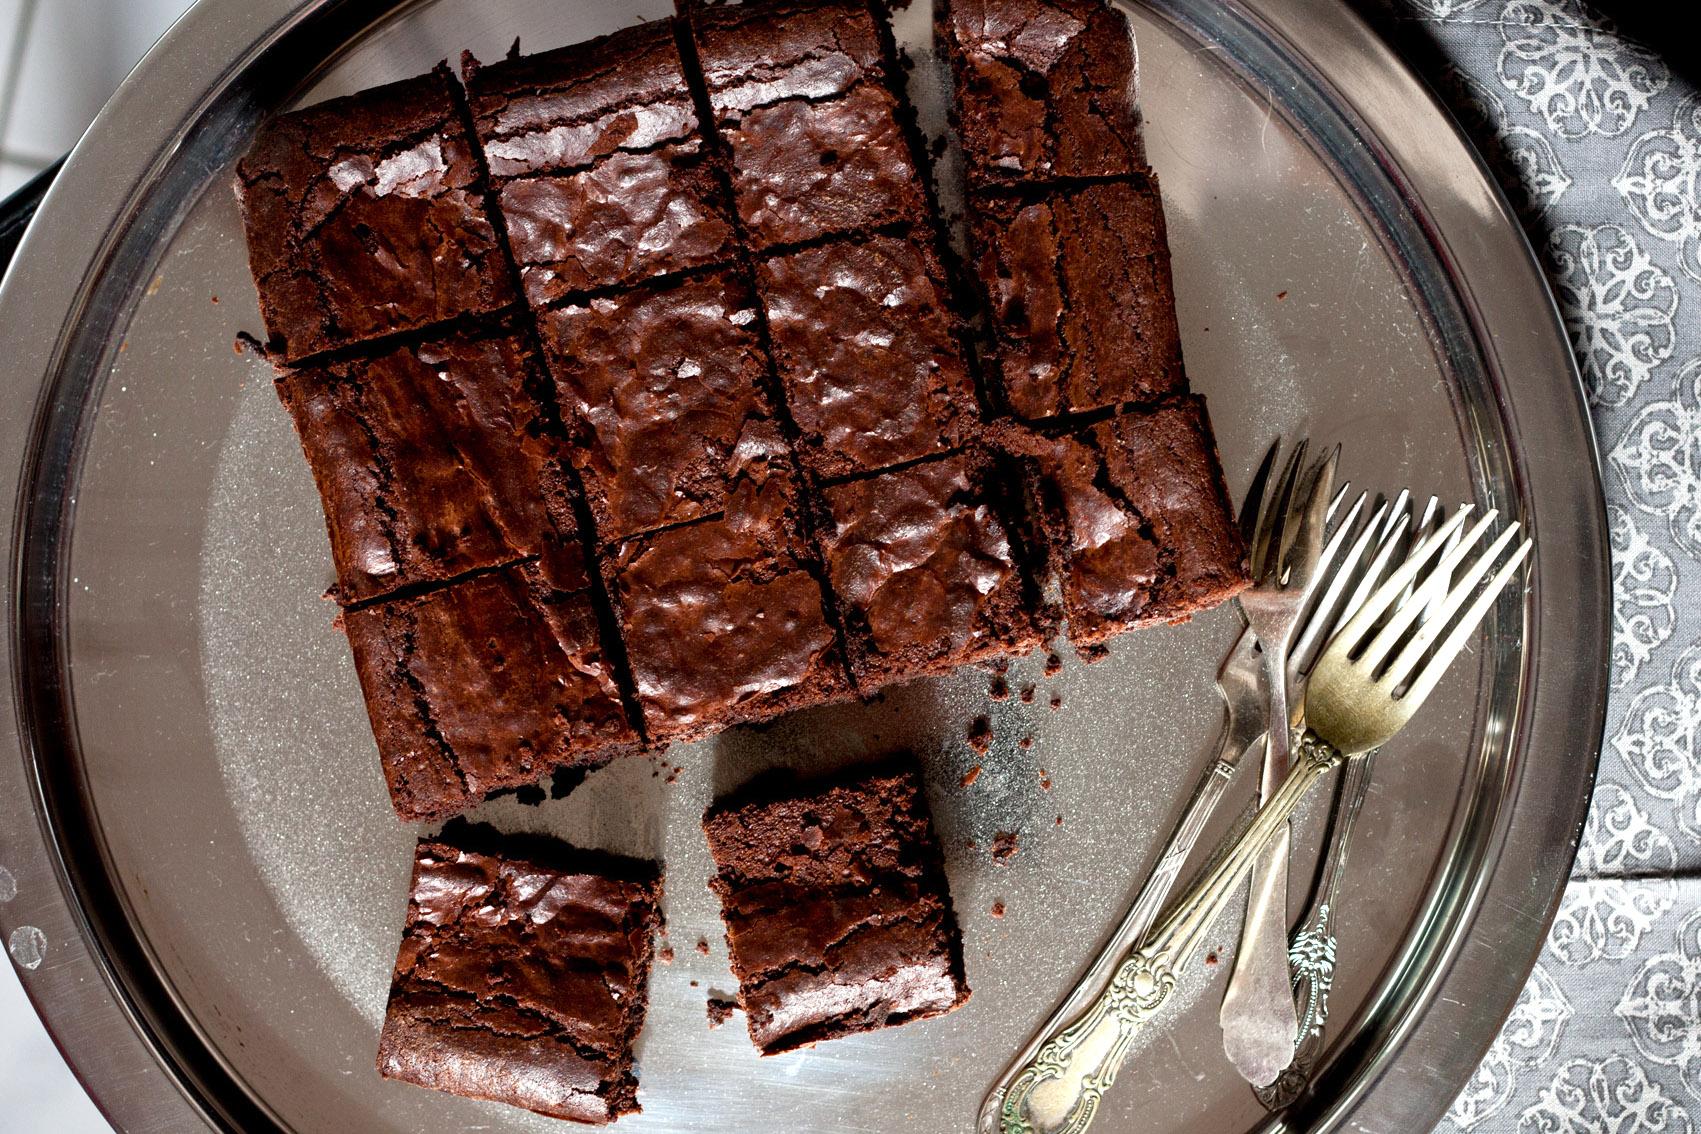 Extra fudgy Brownies